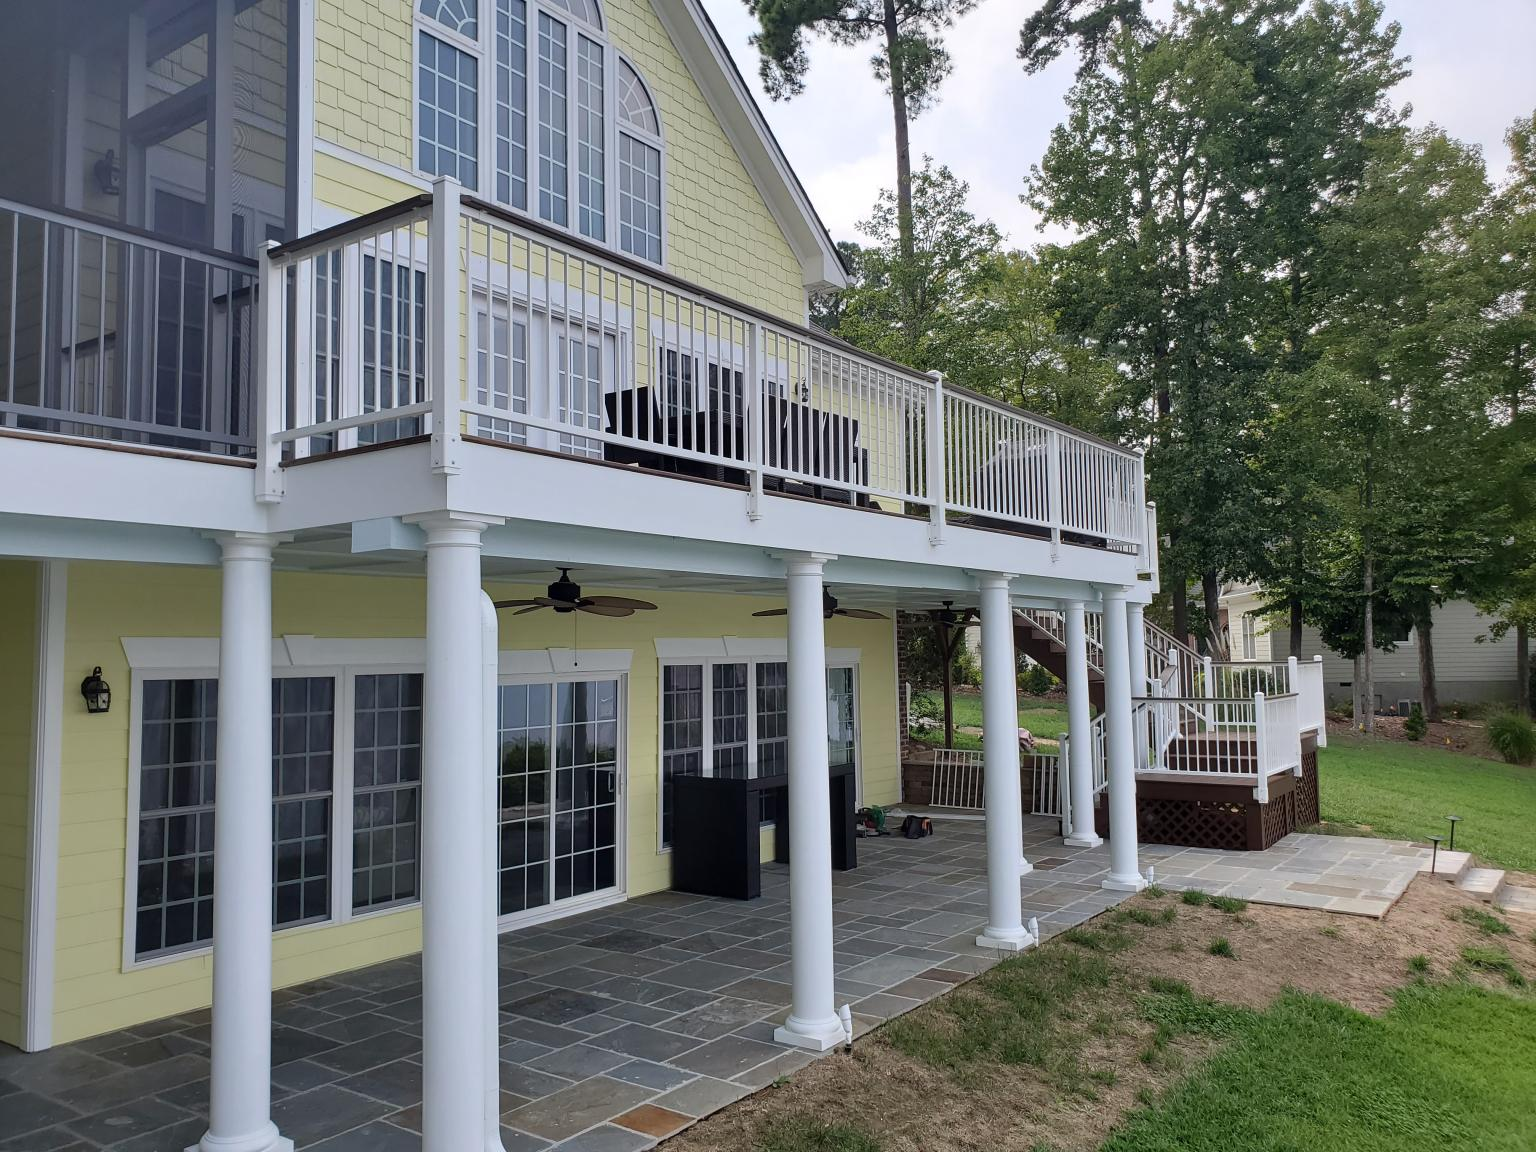 Royal railings ultralox and fibron railing products